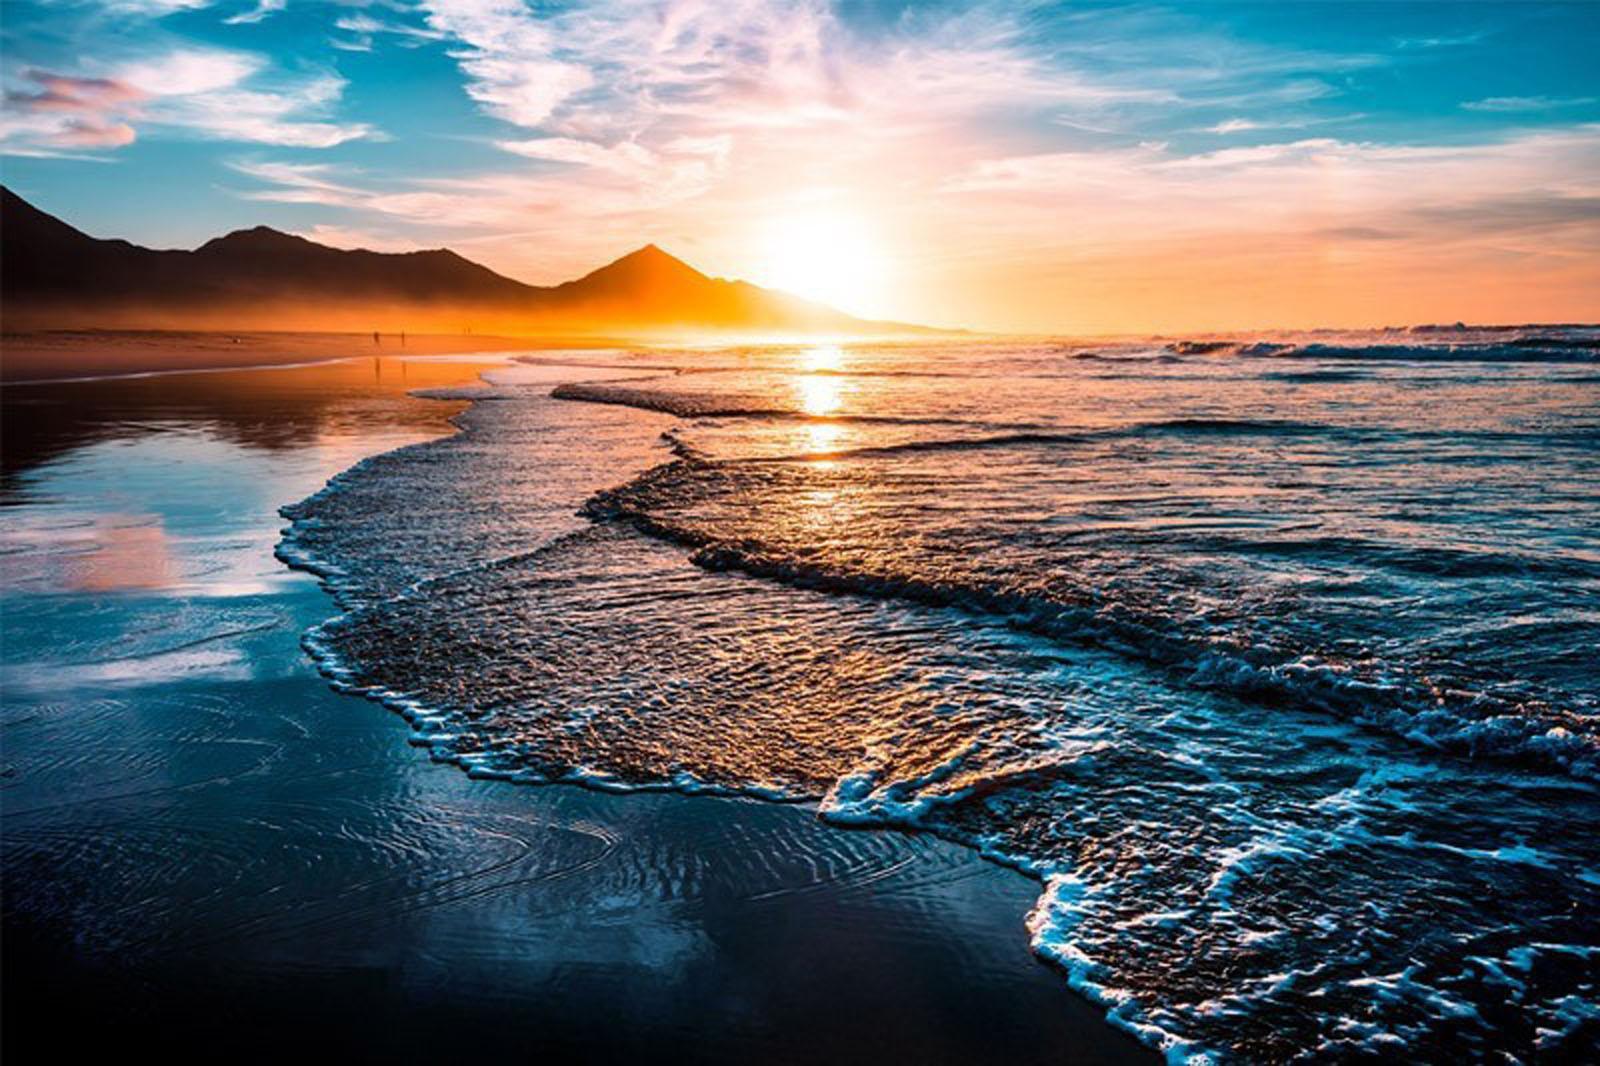 Beach Sunset with Endless Horizon Image